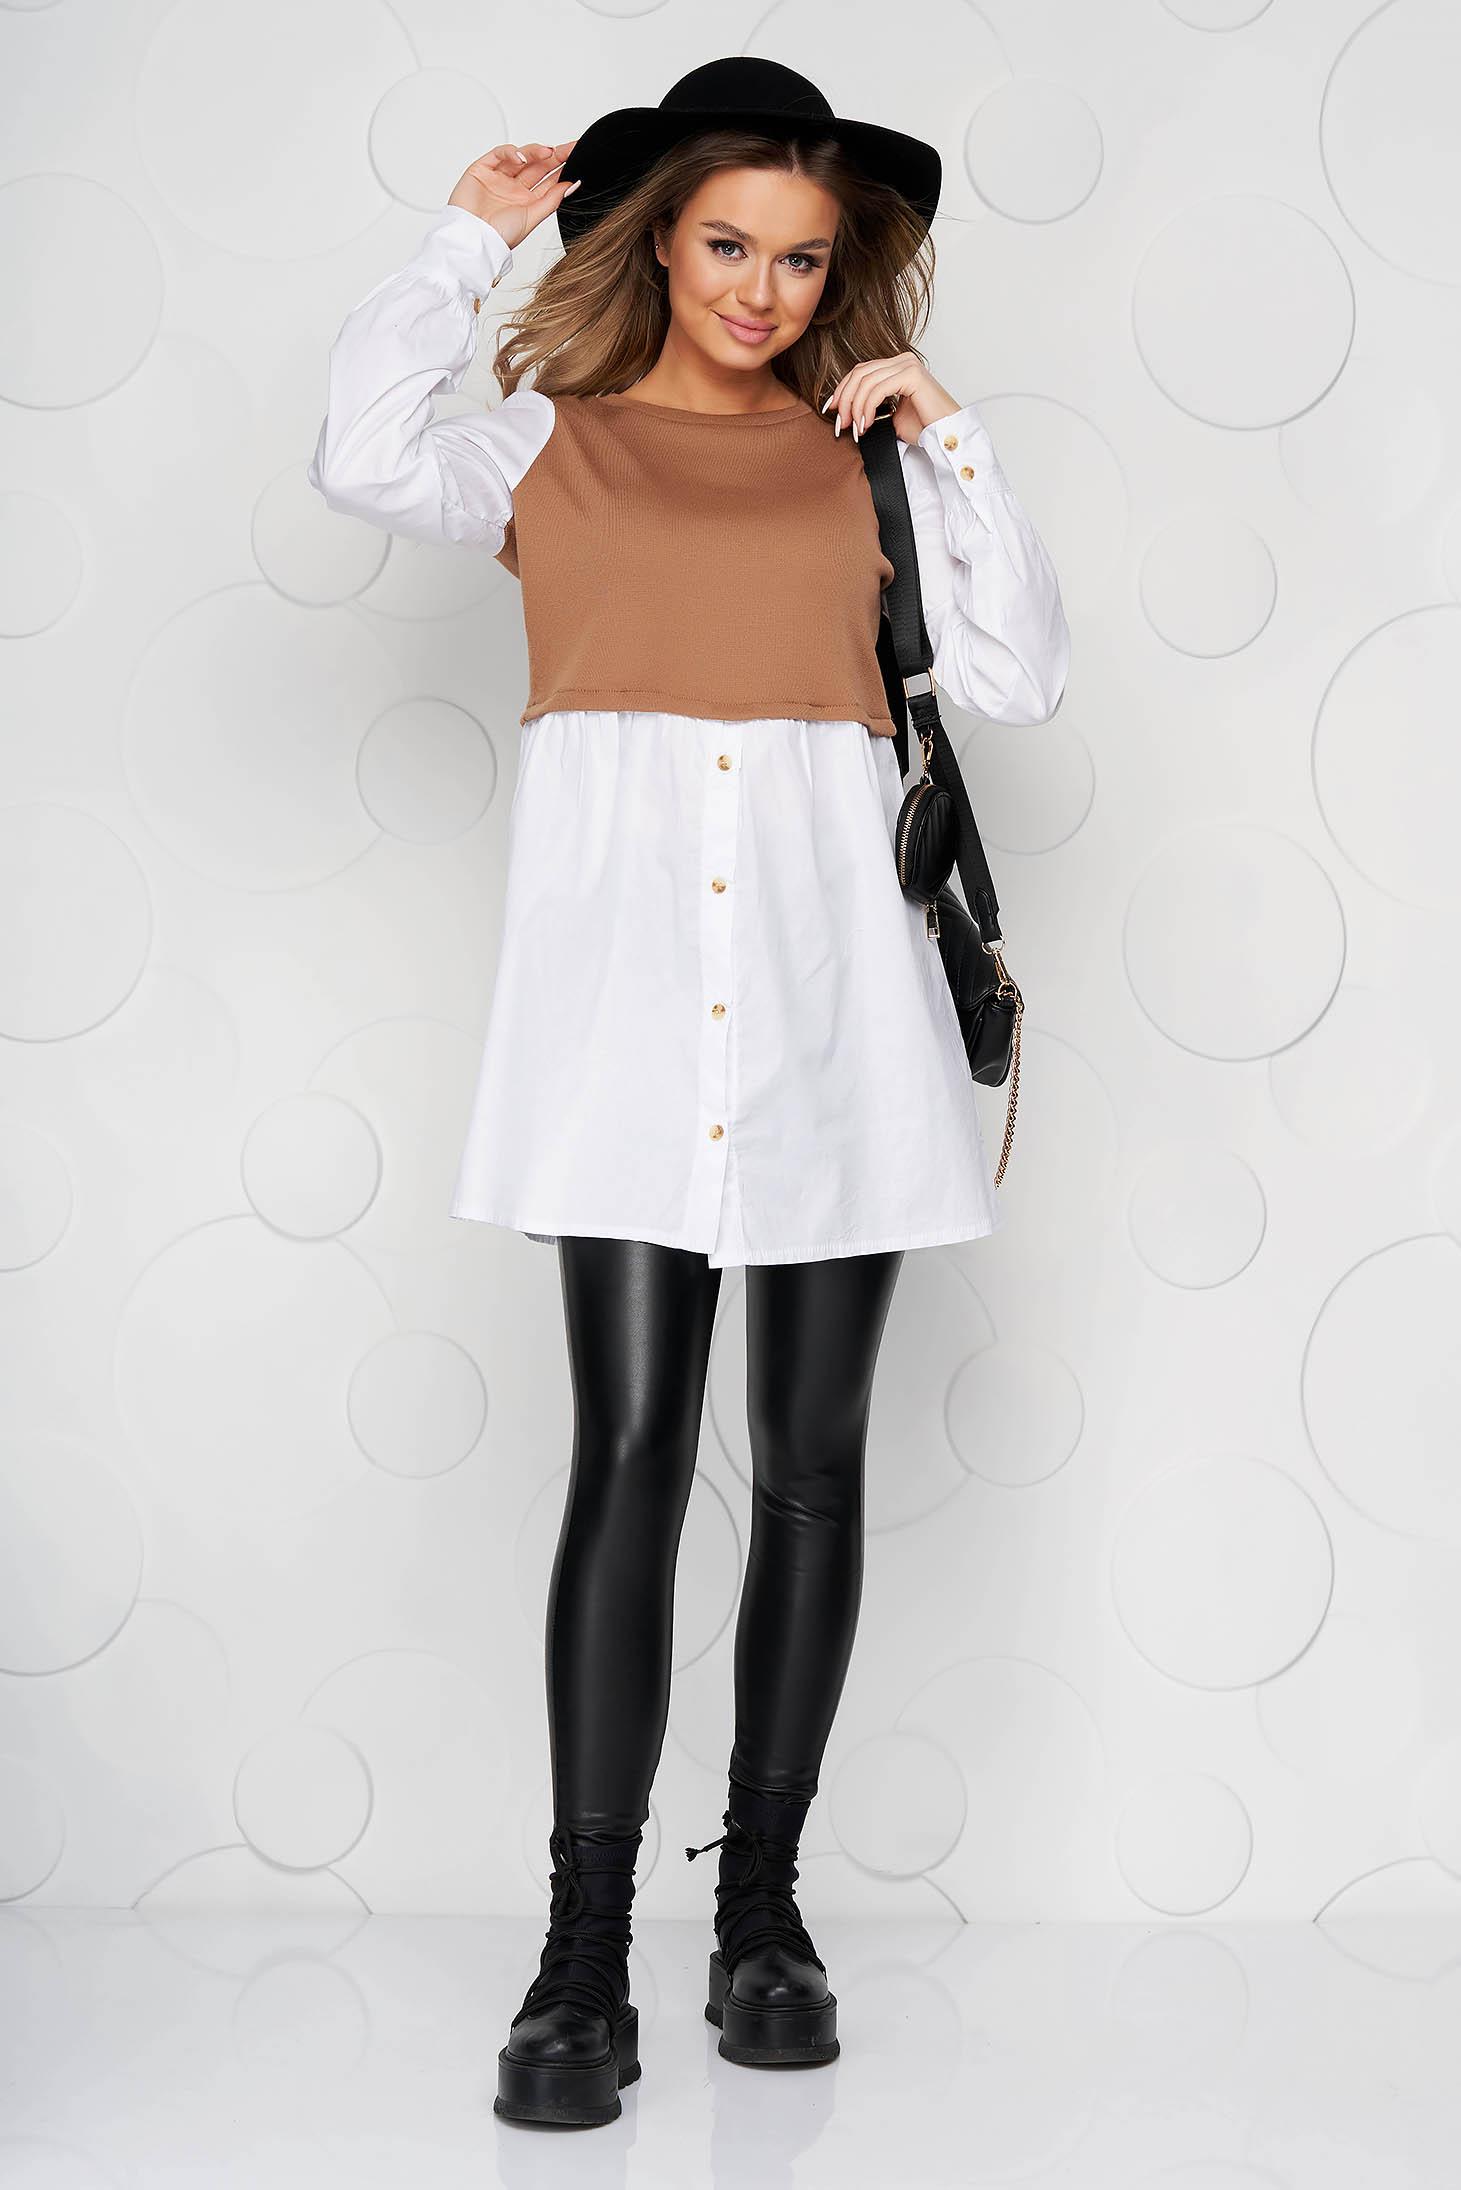 Rochie cappuccino tip camasa din bumbac subtire si tricot cu croi larg